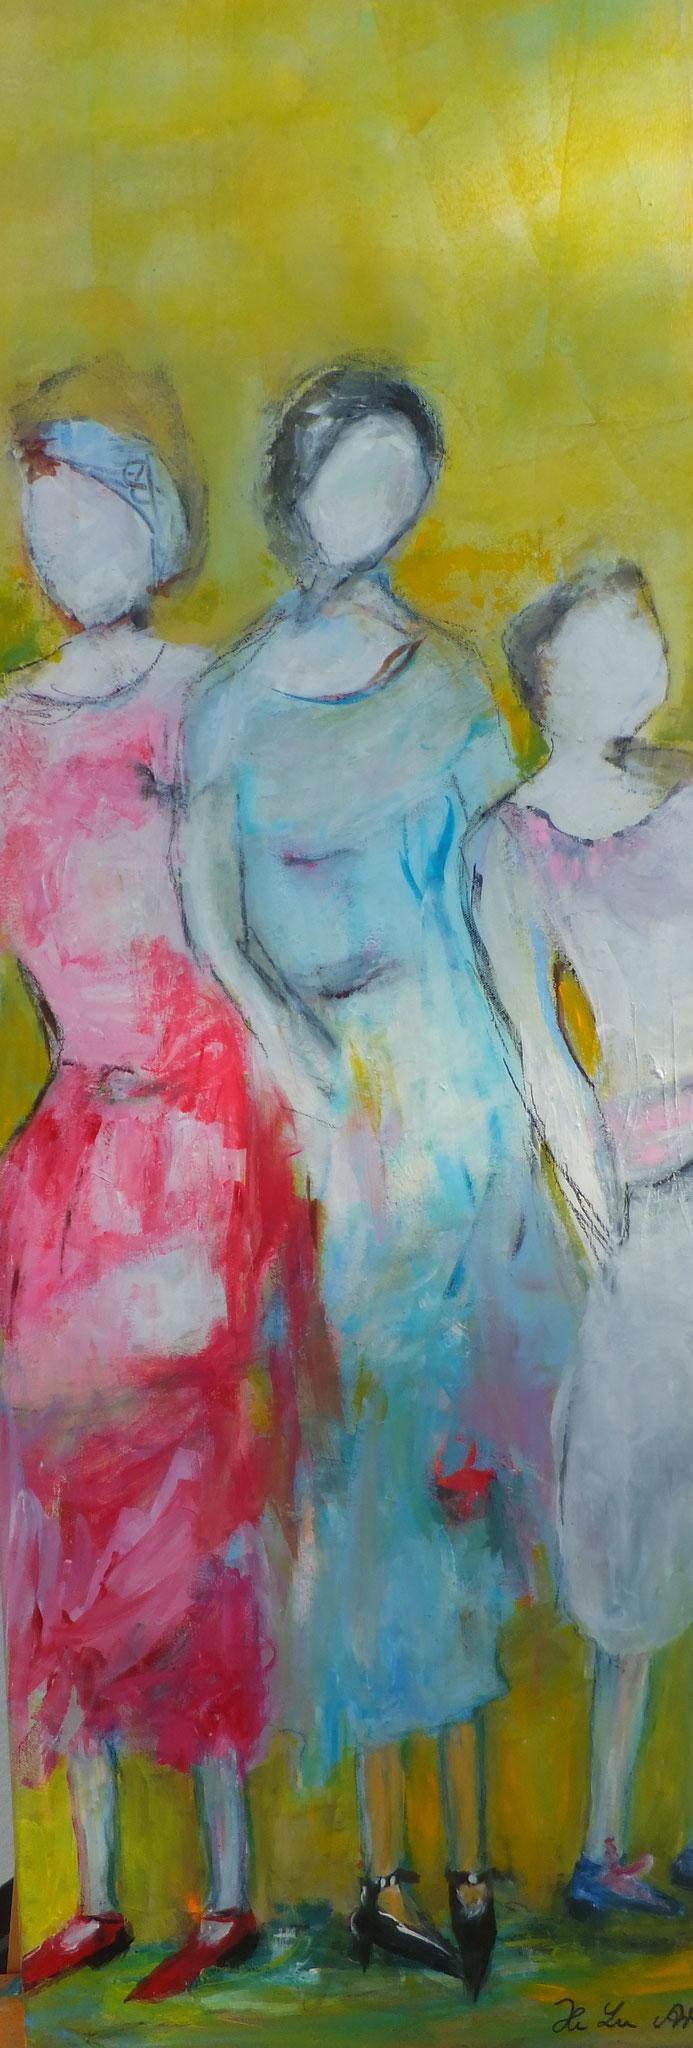 Sommerfrauen  40 x 120 cm  Acryl auf Leinwand